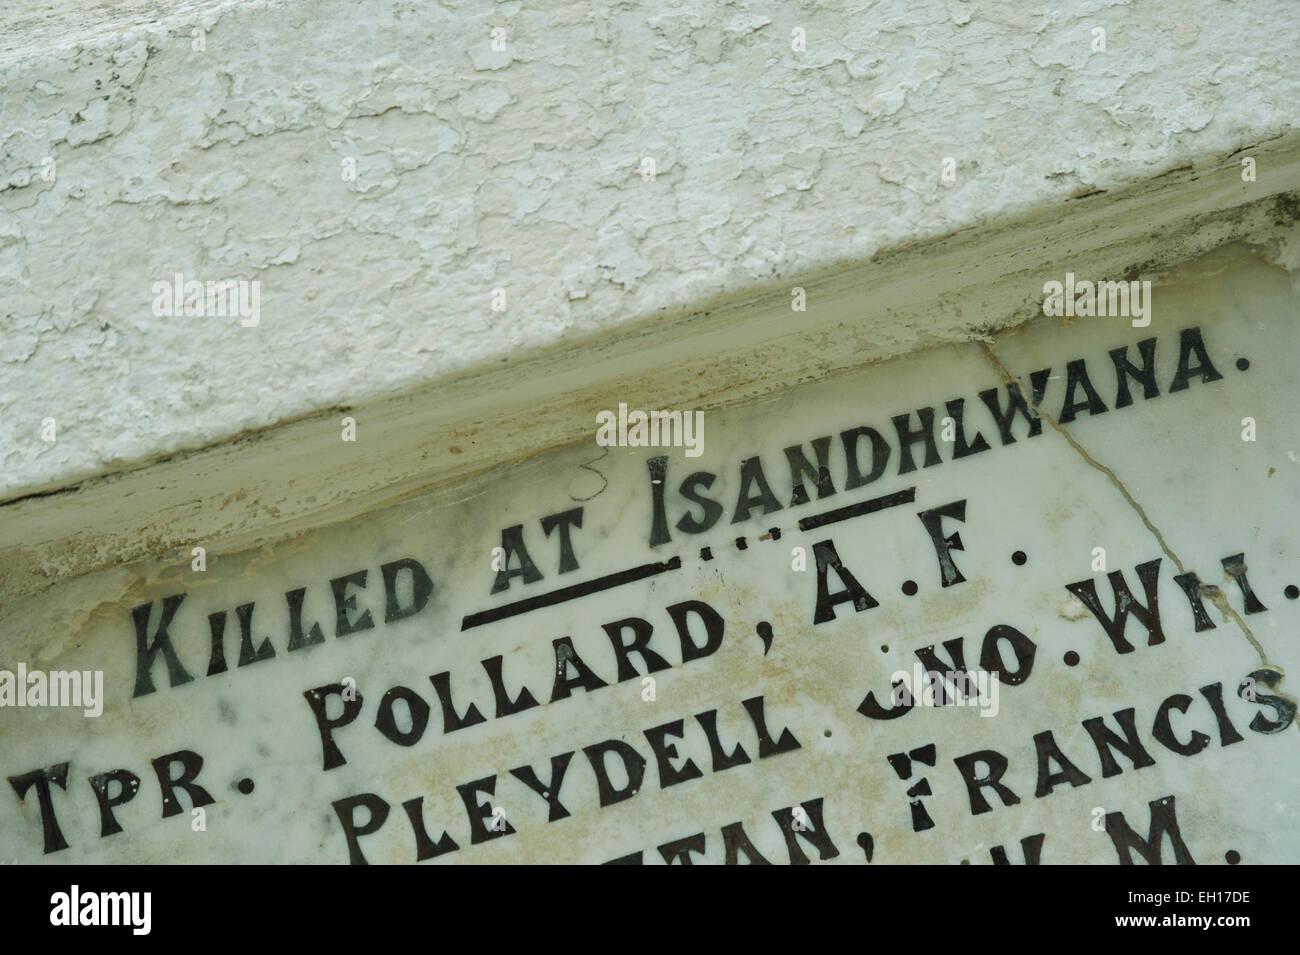 KwaZulu-Natal, South Africa, words, Killed at Isandlwana, inscription on battlefield memorial Anglo-Zulu war battle, - Stock Image